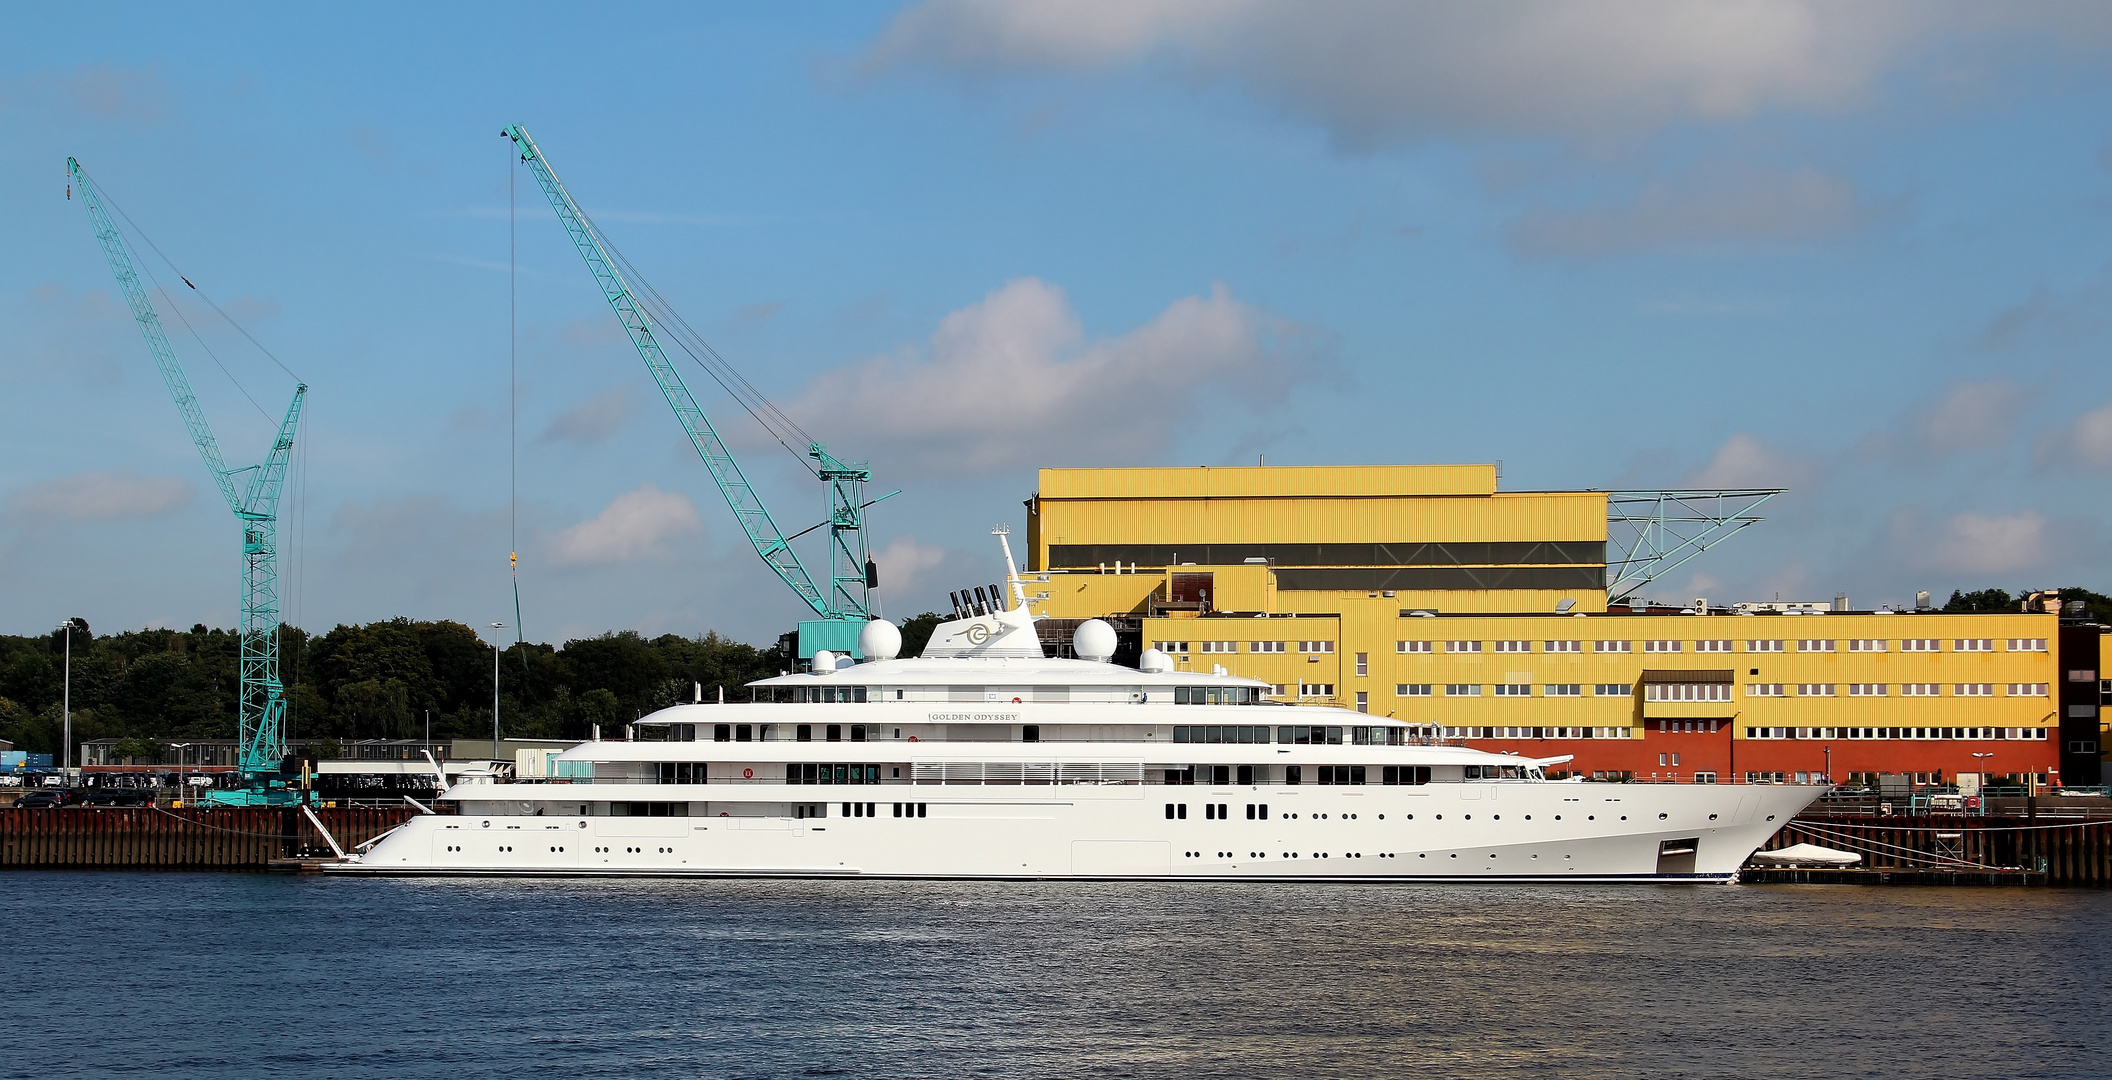 Megayacht Golden Odyssey